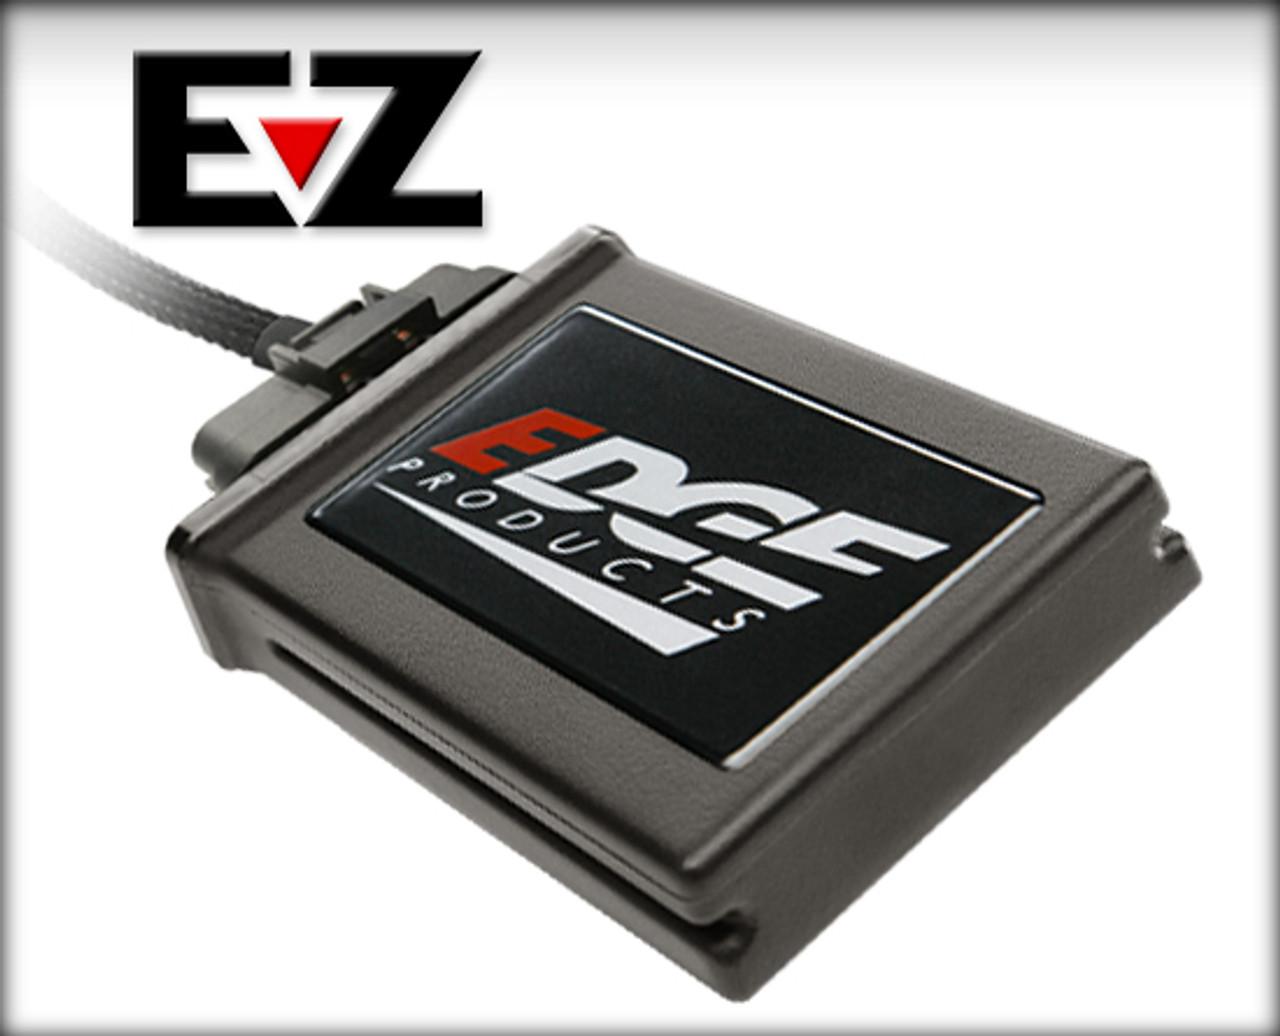 04.5-07 600 Dodge Power Edge Ez 65 HP 150Ibs Of Torque (3 Stage W/Switch)